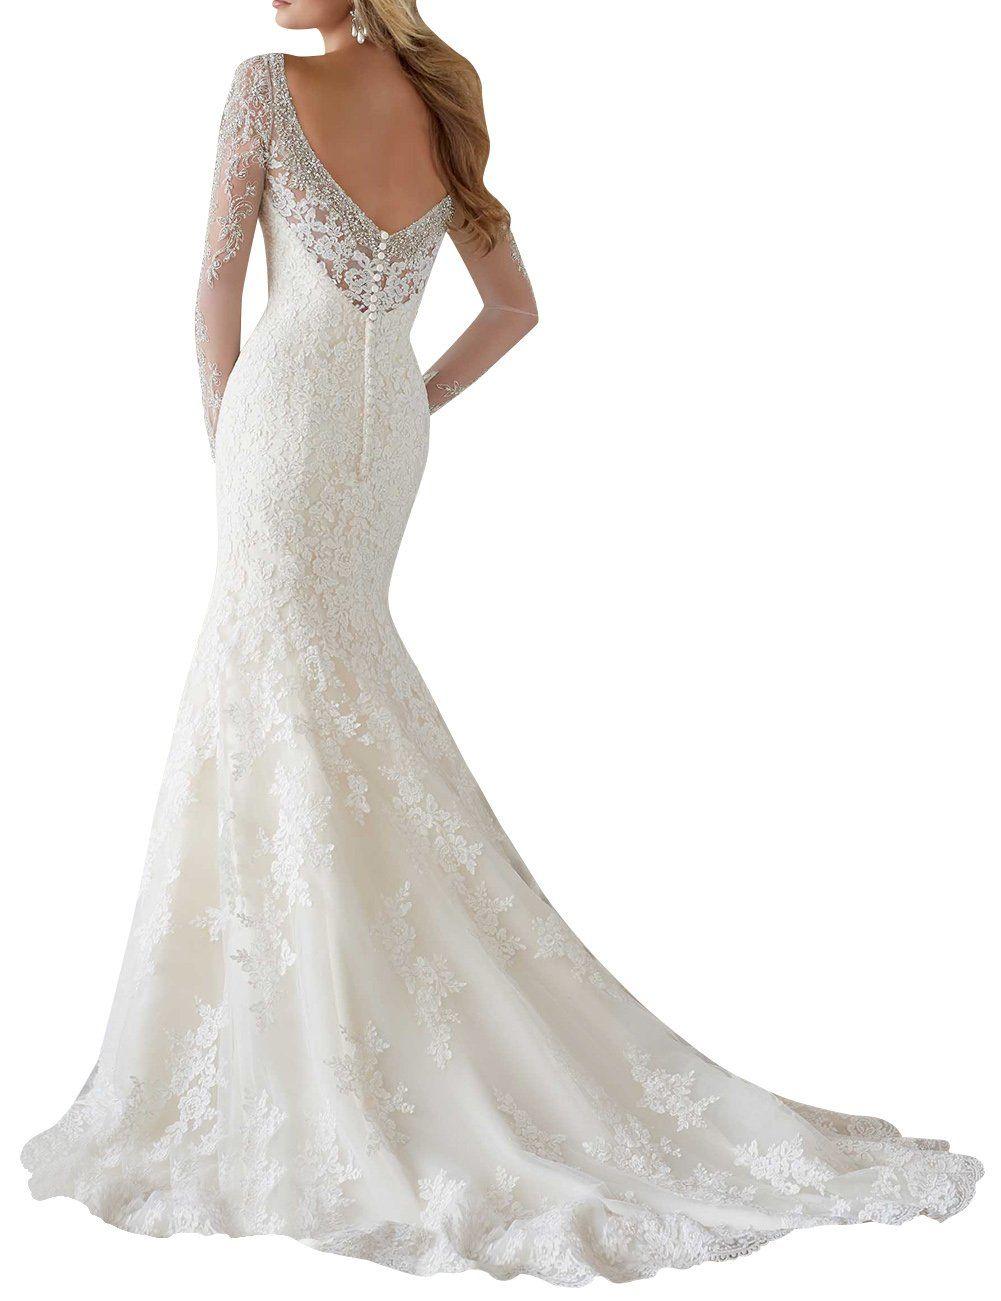 39c55ac528c0 Dapene Womens VNeck Long Sleeve Low Back Train Wedding Dress White US 2 >>>